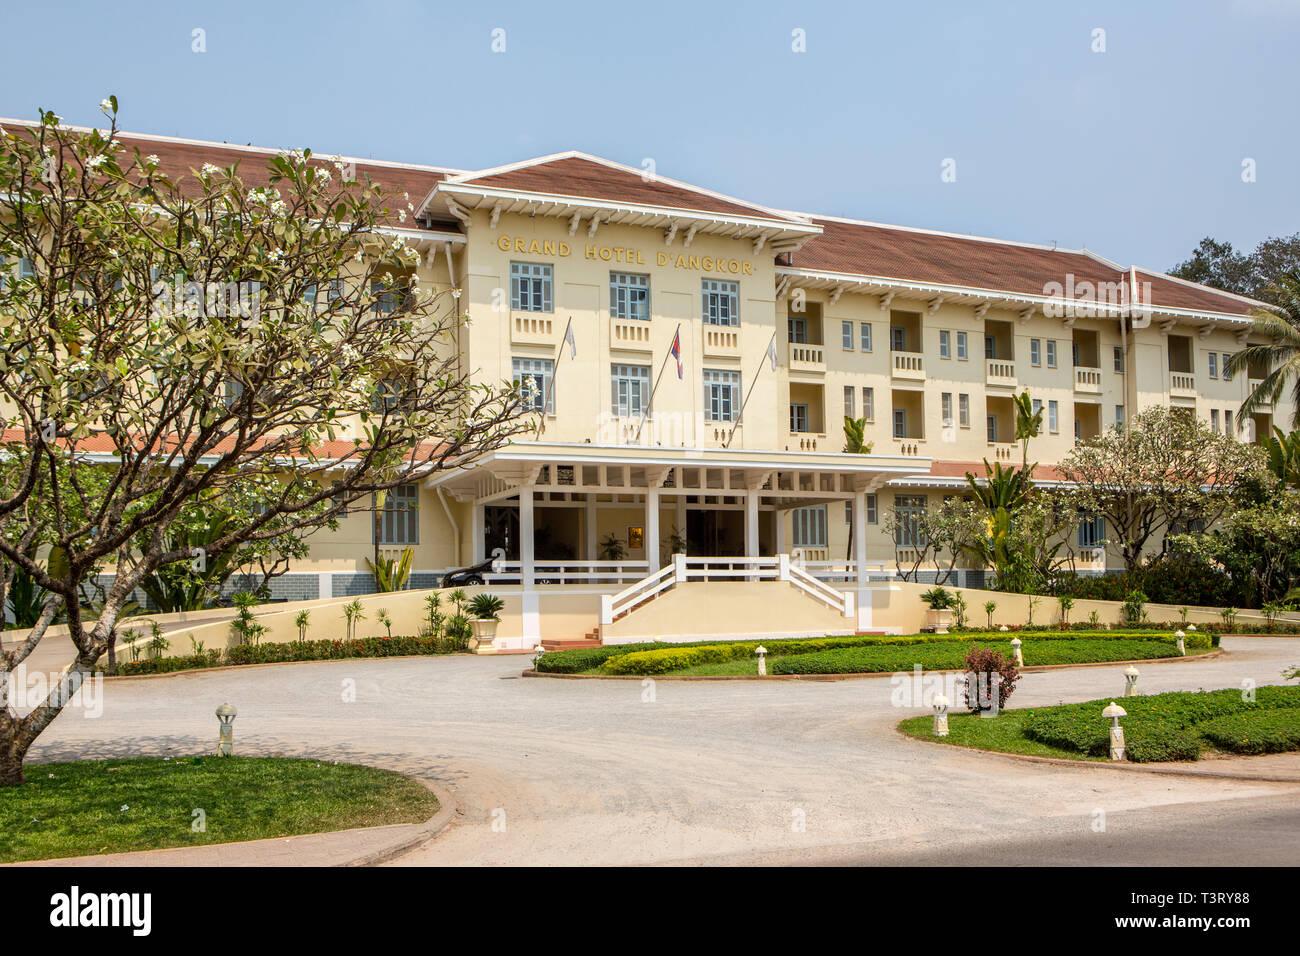 Raffles Grand Hotel D Angkor Siem Reap Cambodia Stock Photo Alamy